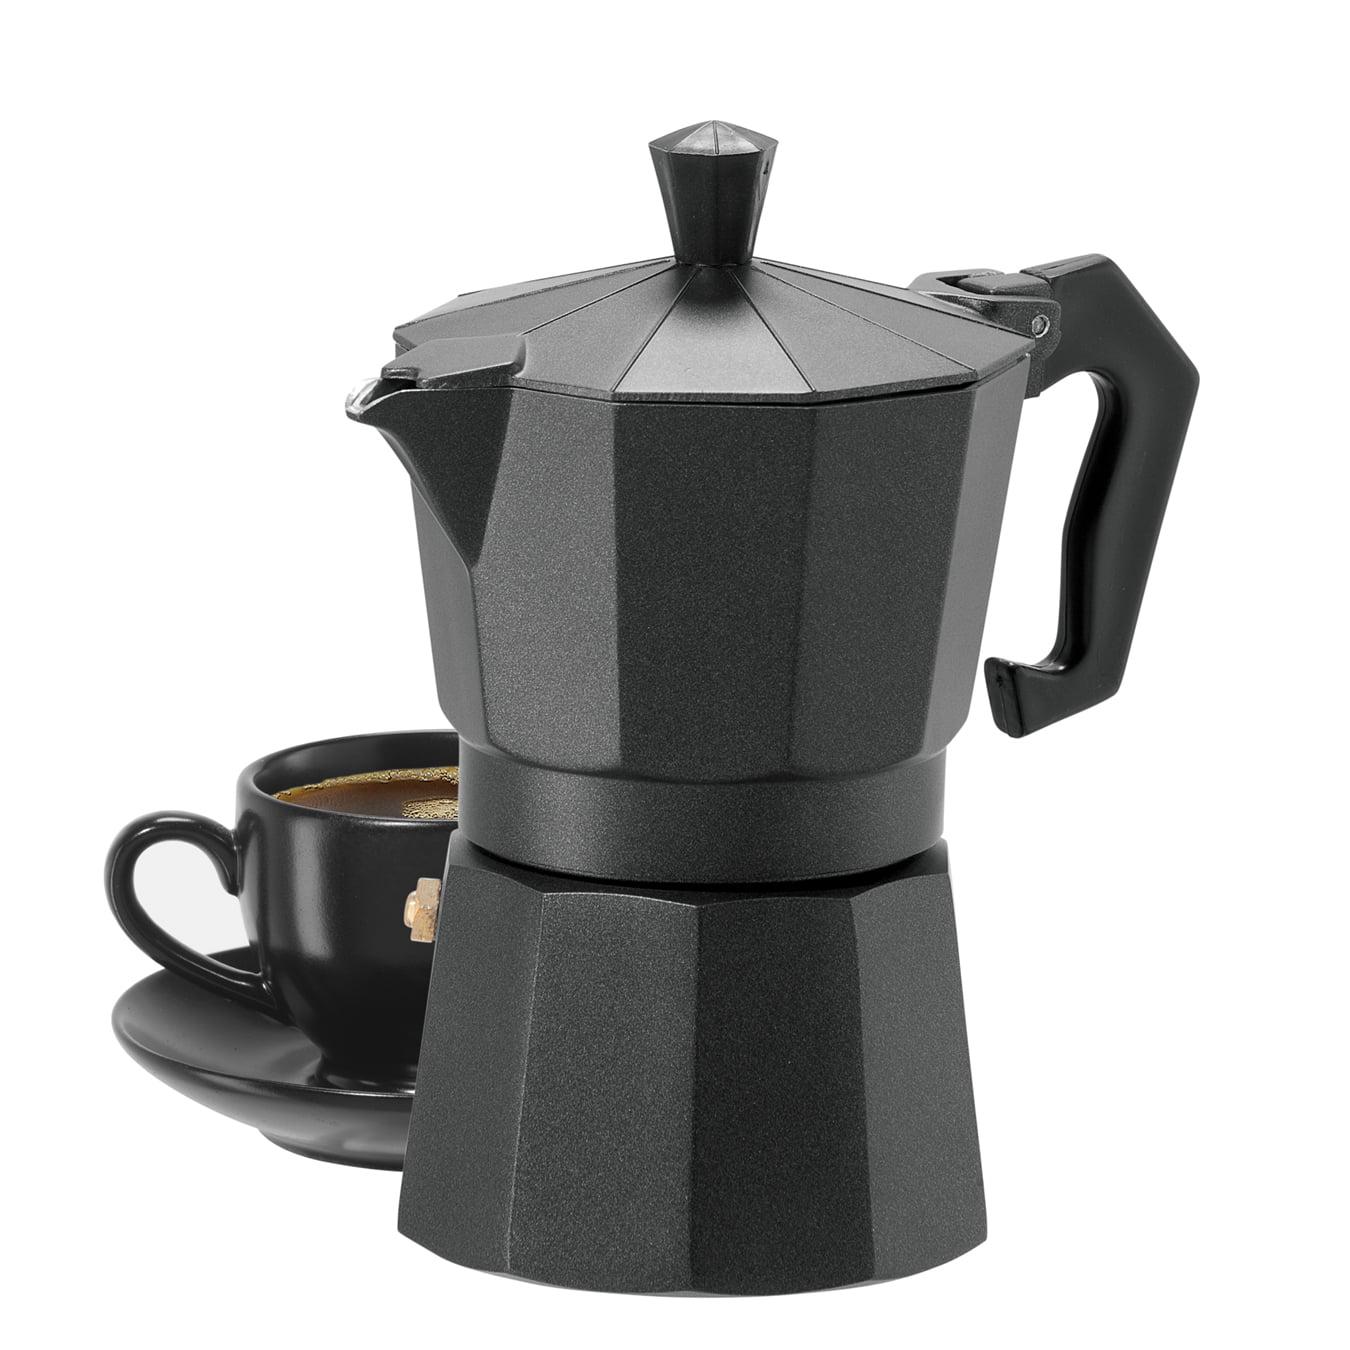 Oggi 6570.0 3 Cup Cast Aluminum Stovetop Espresso Maker, Silver